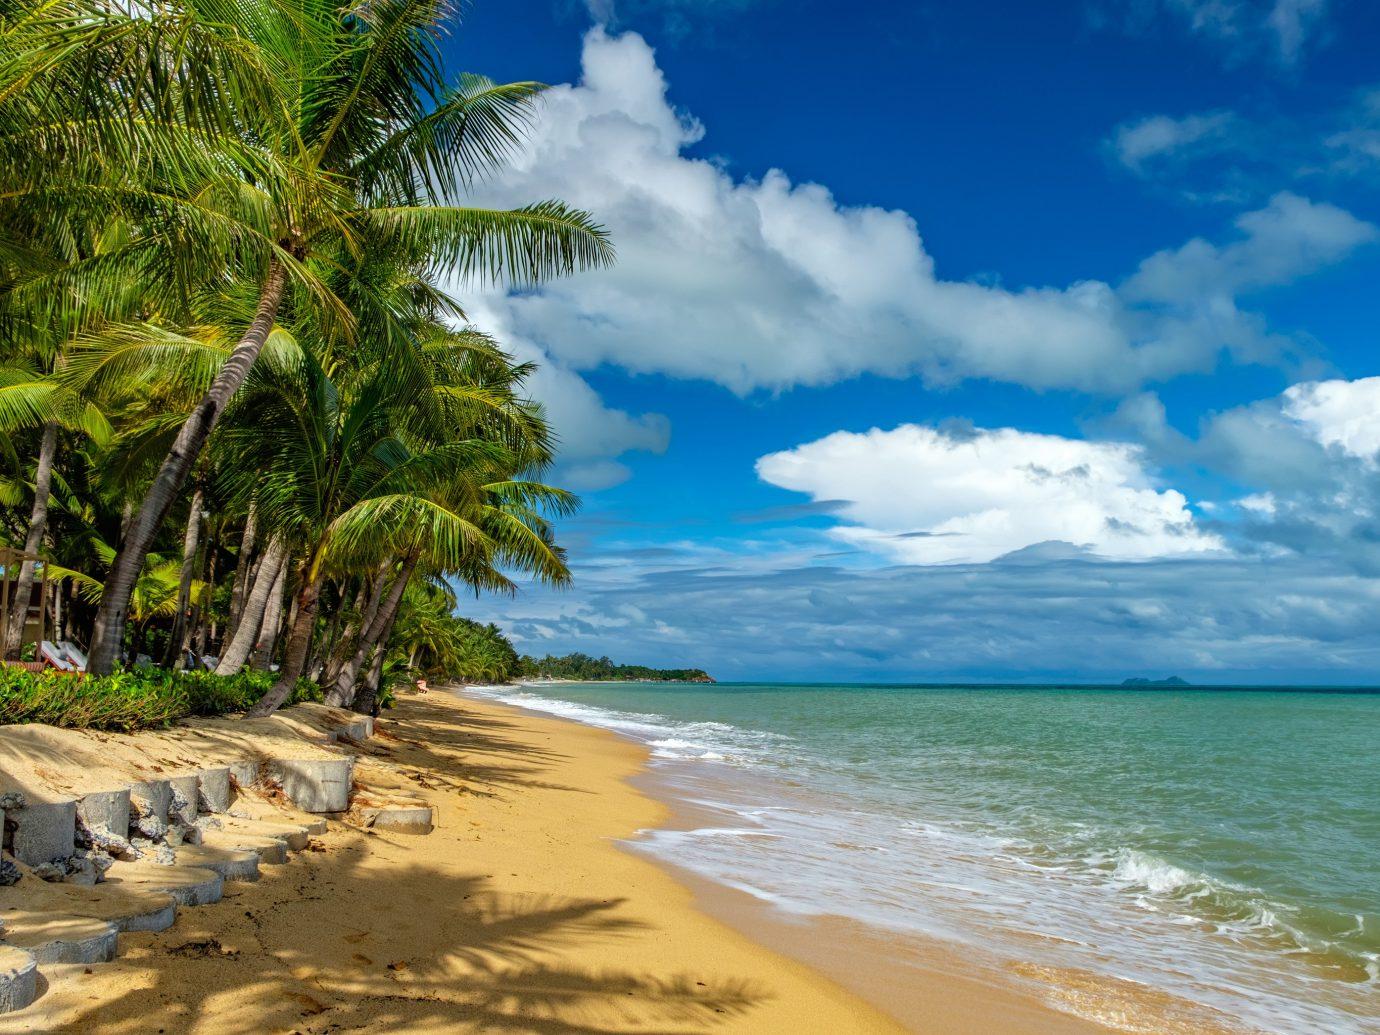 beautiful sandy beach at Maenam Beach, Koh Samui